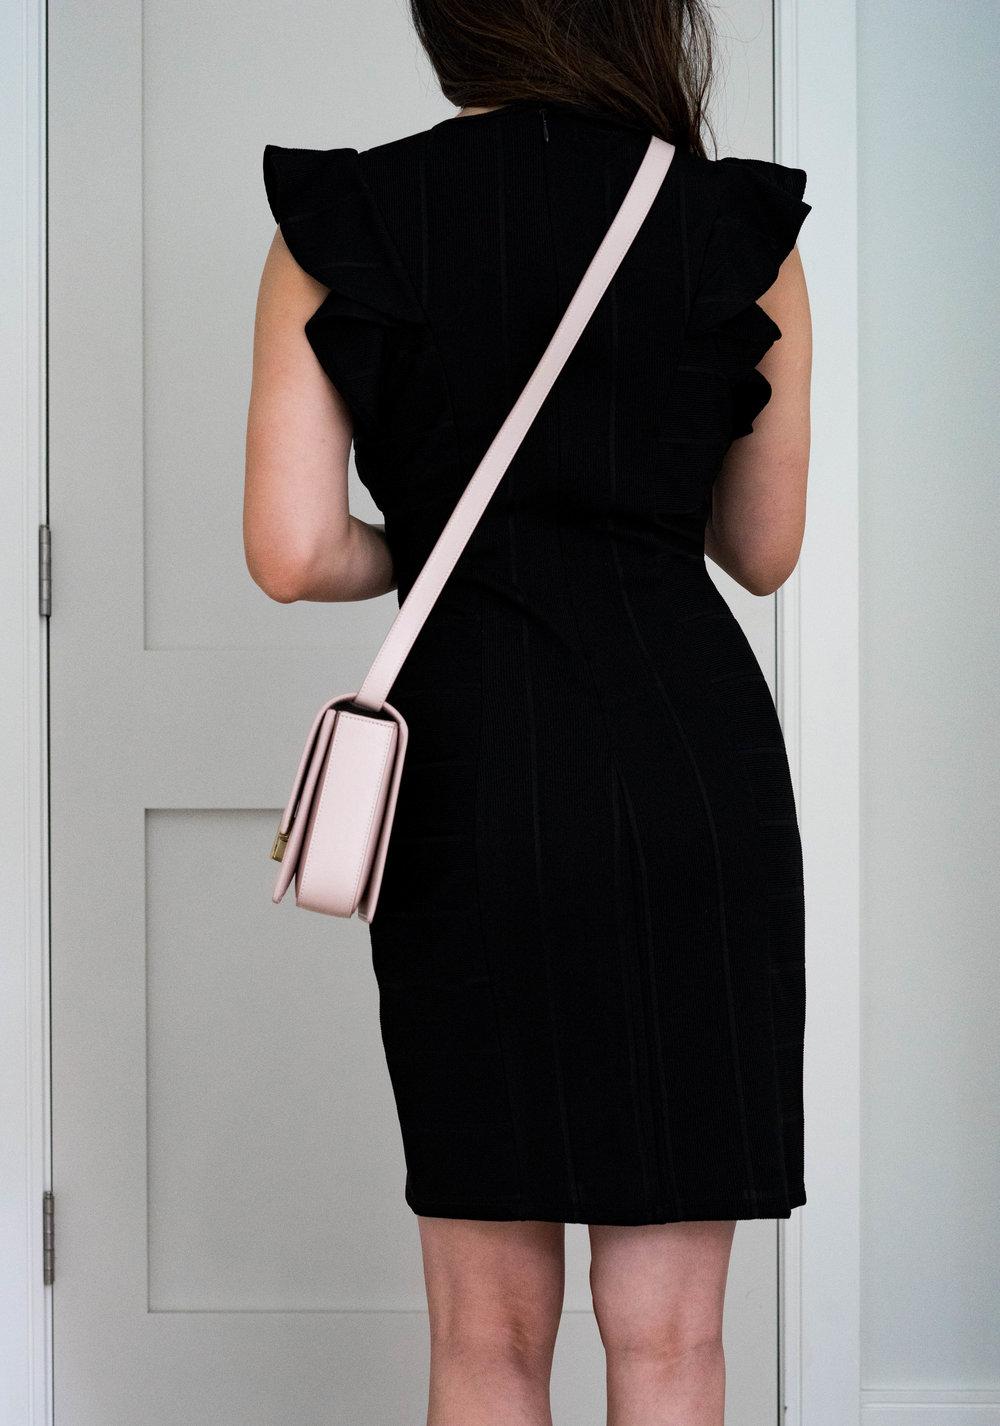 YSL Bellechase Bag Review in Blush: TheNinesBlog.com - A Boston Blog